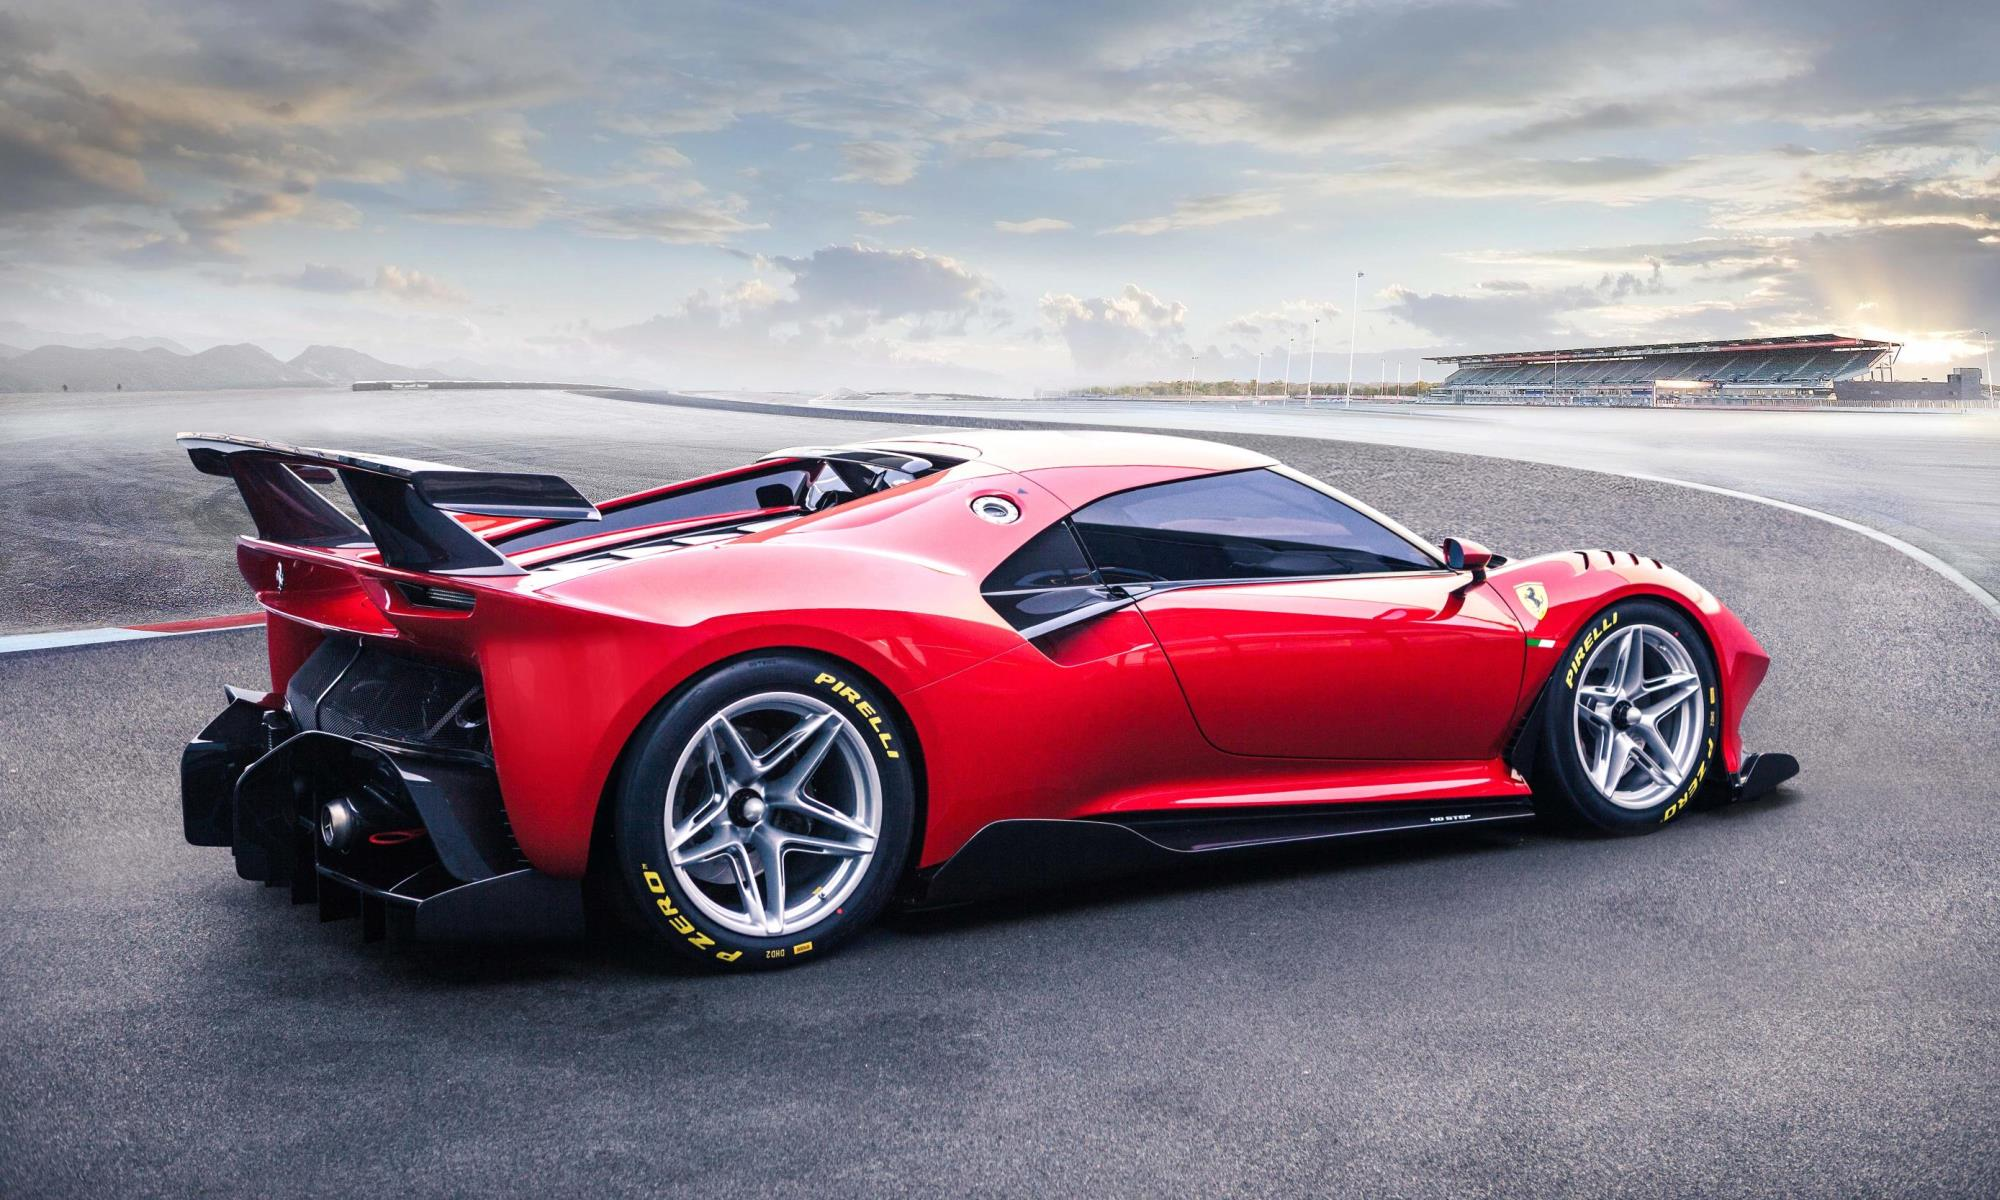 Ferrari P80/C rear